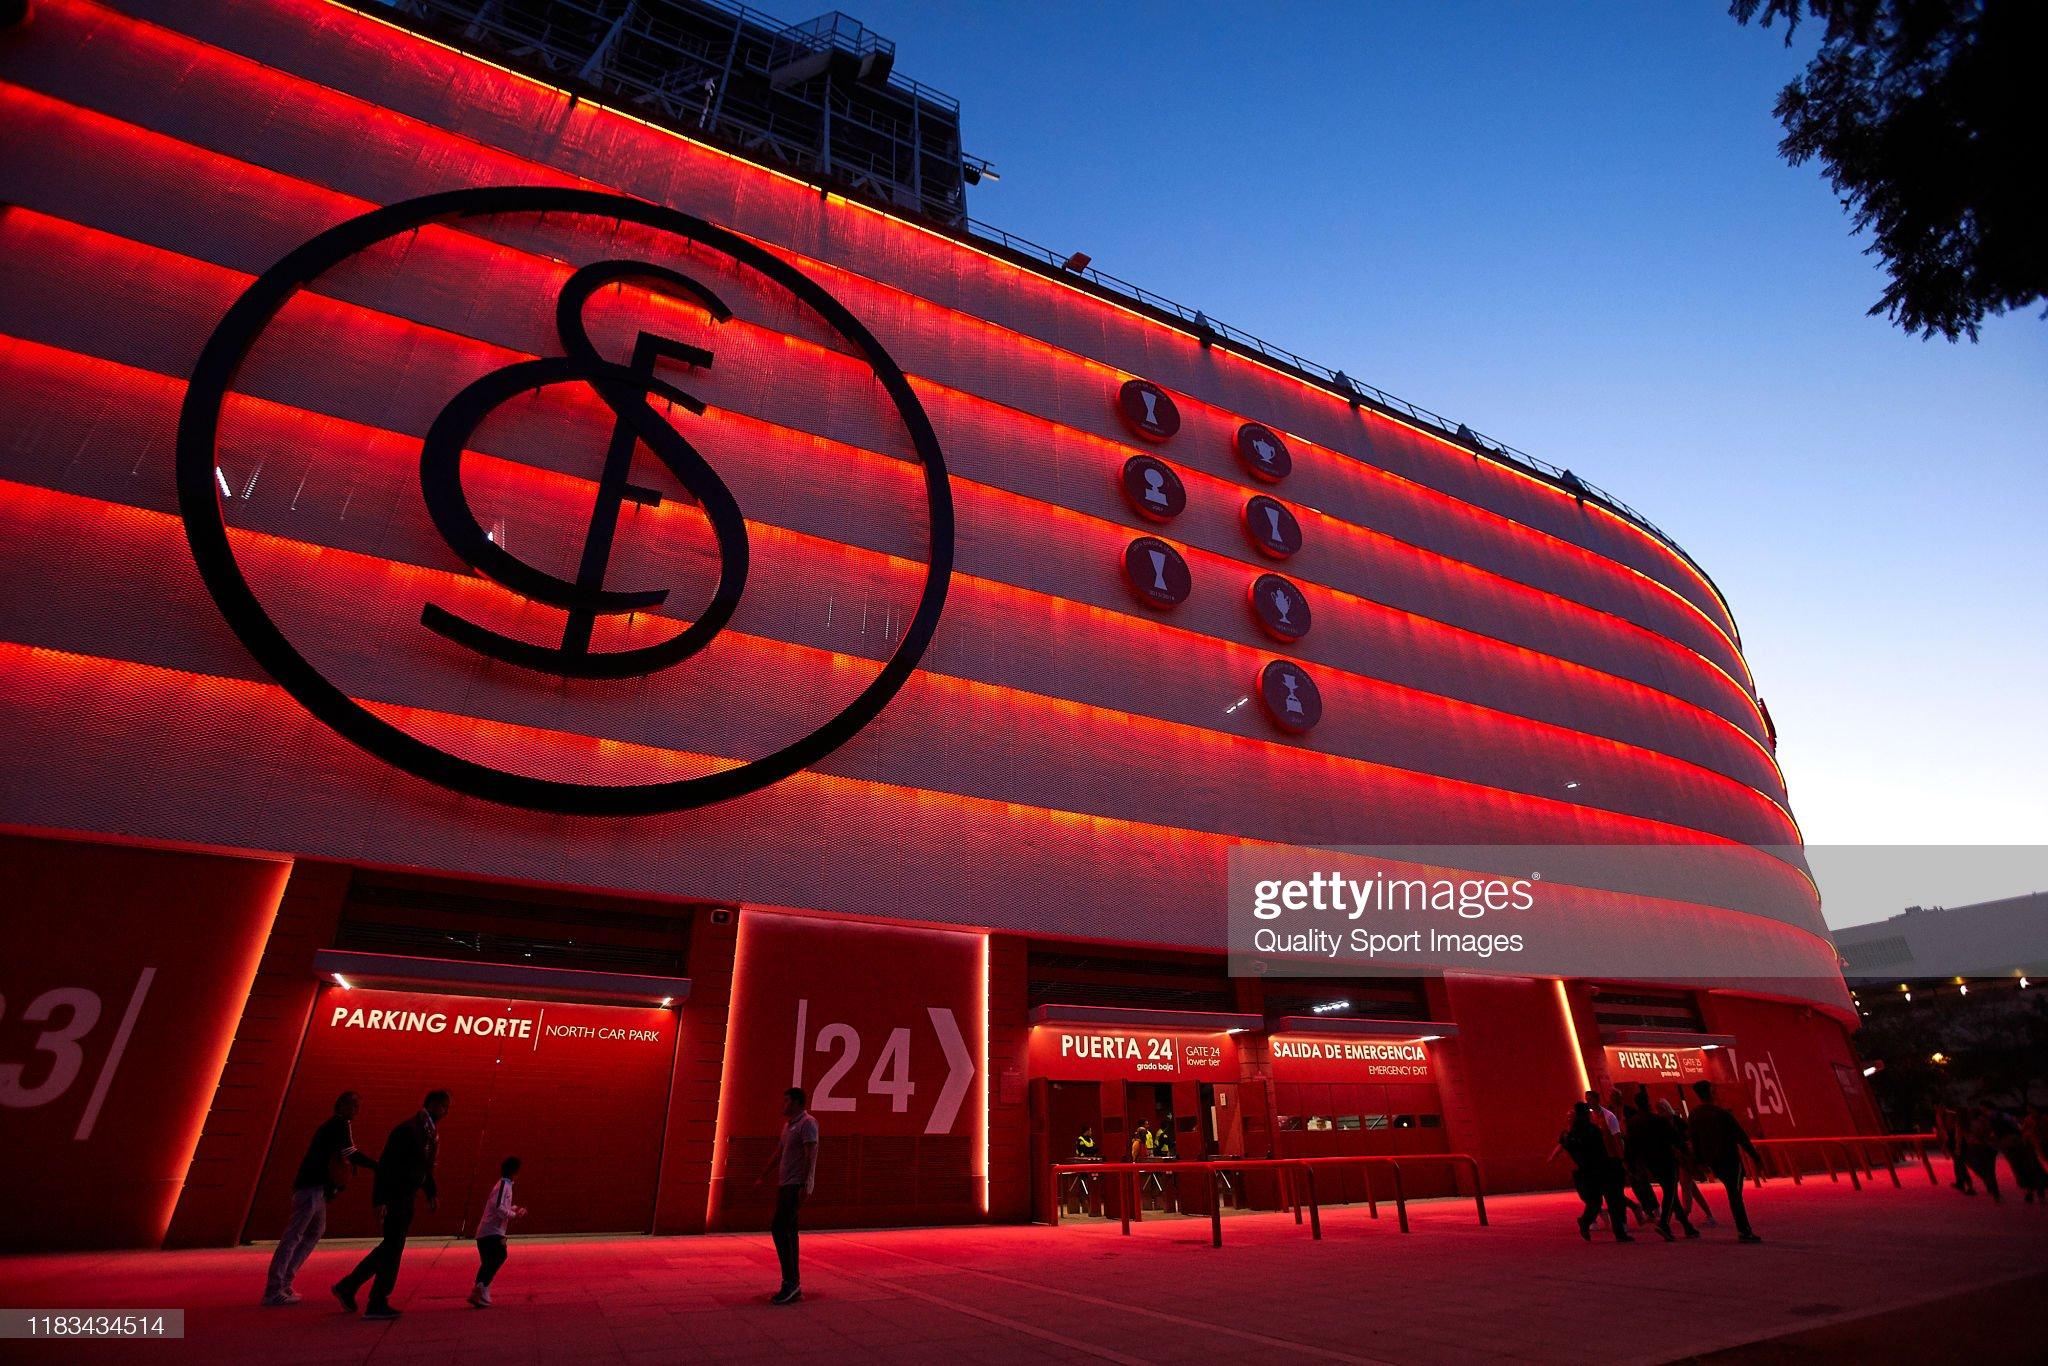 Sevilla v Athletic Bilbao preview, prediction and odds